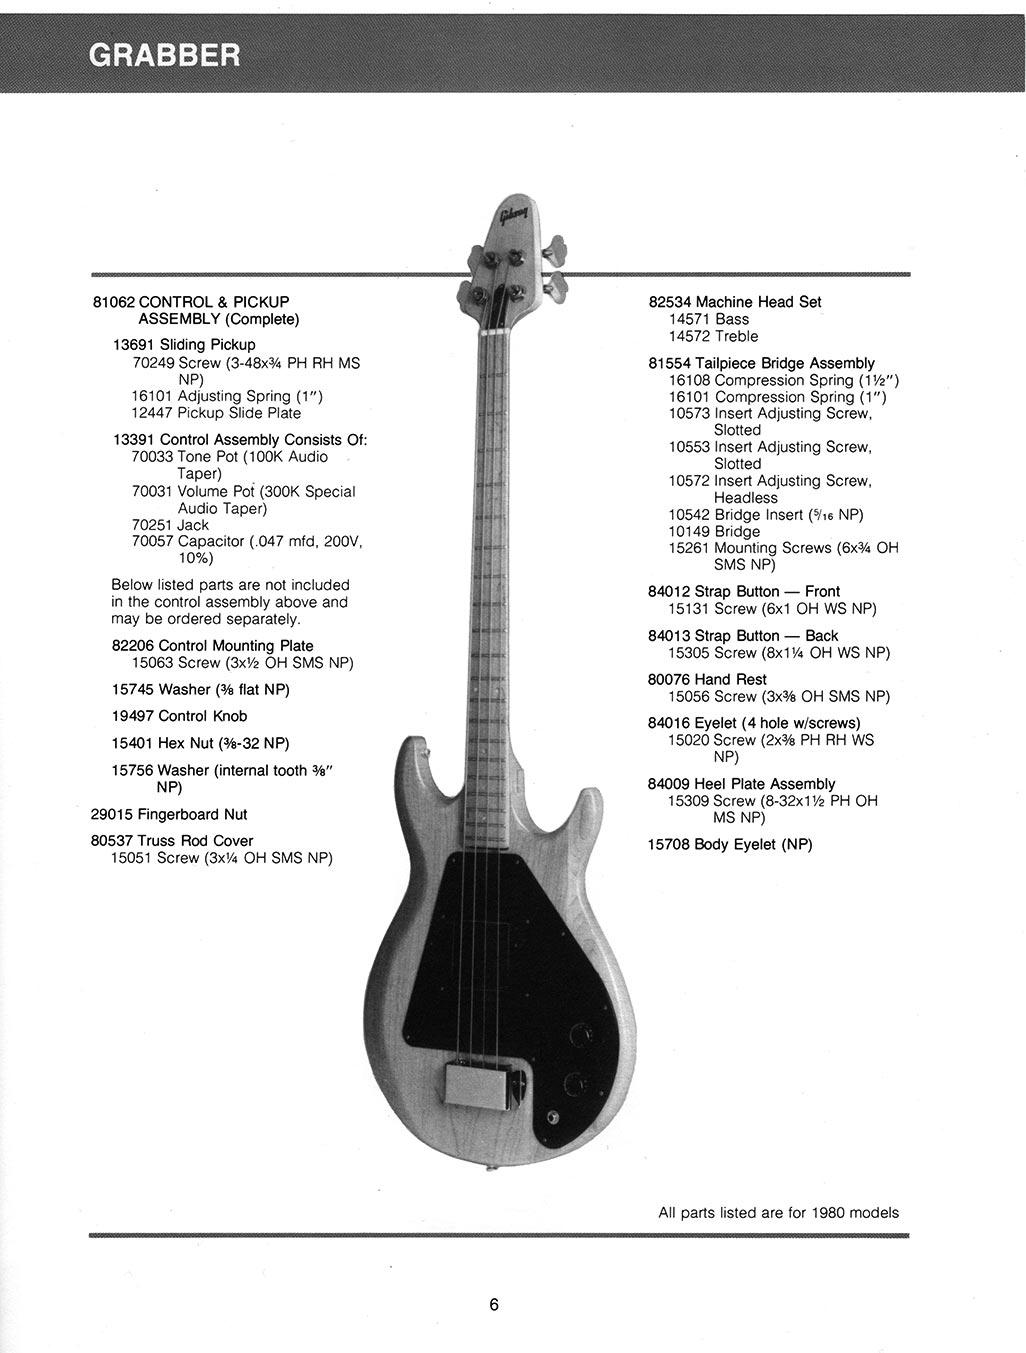 gibson grabber bass guitar parts lists flyguitars. Black Bedroom Furniture Sets. Home Design Ideas